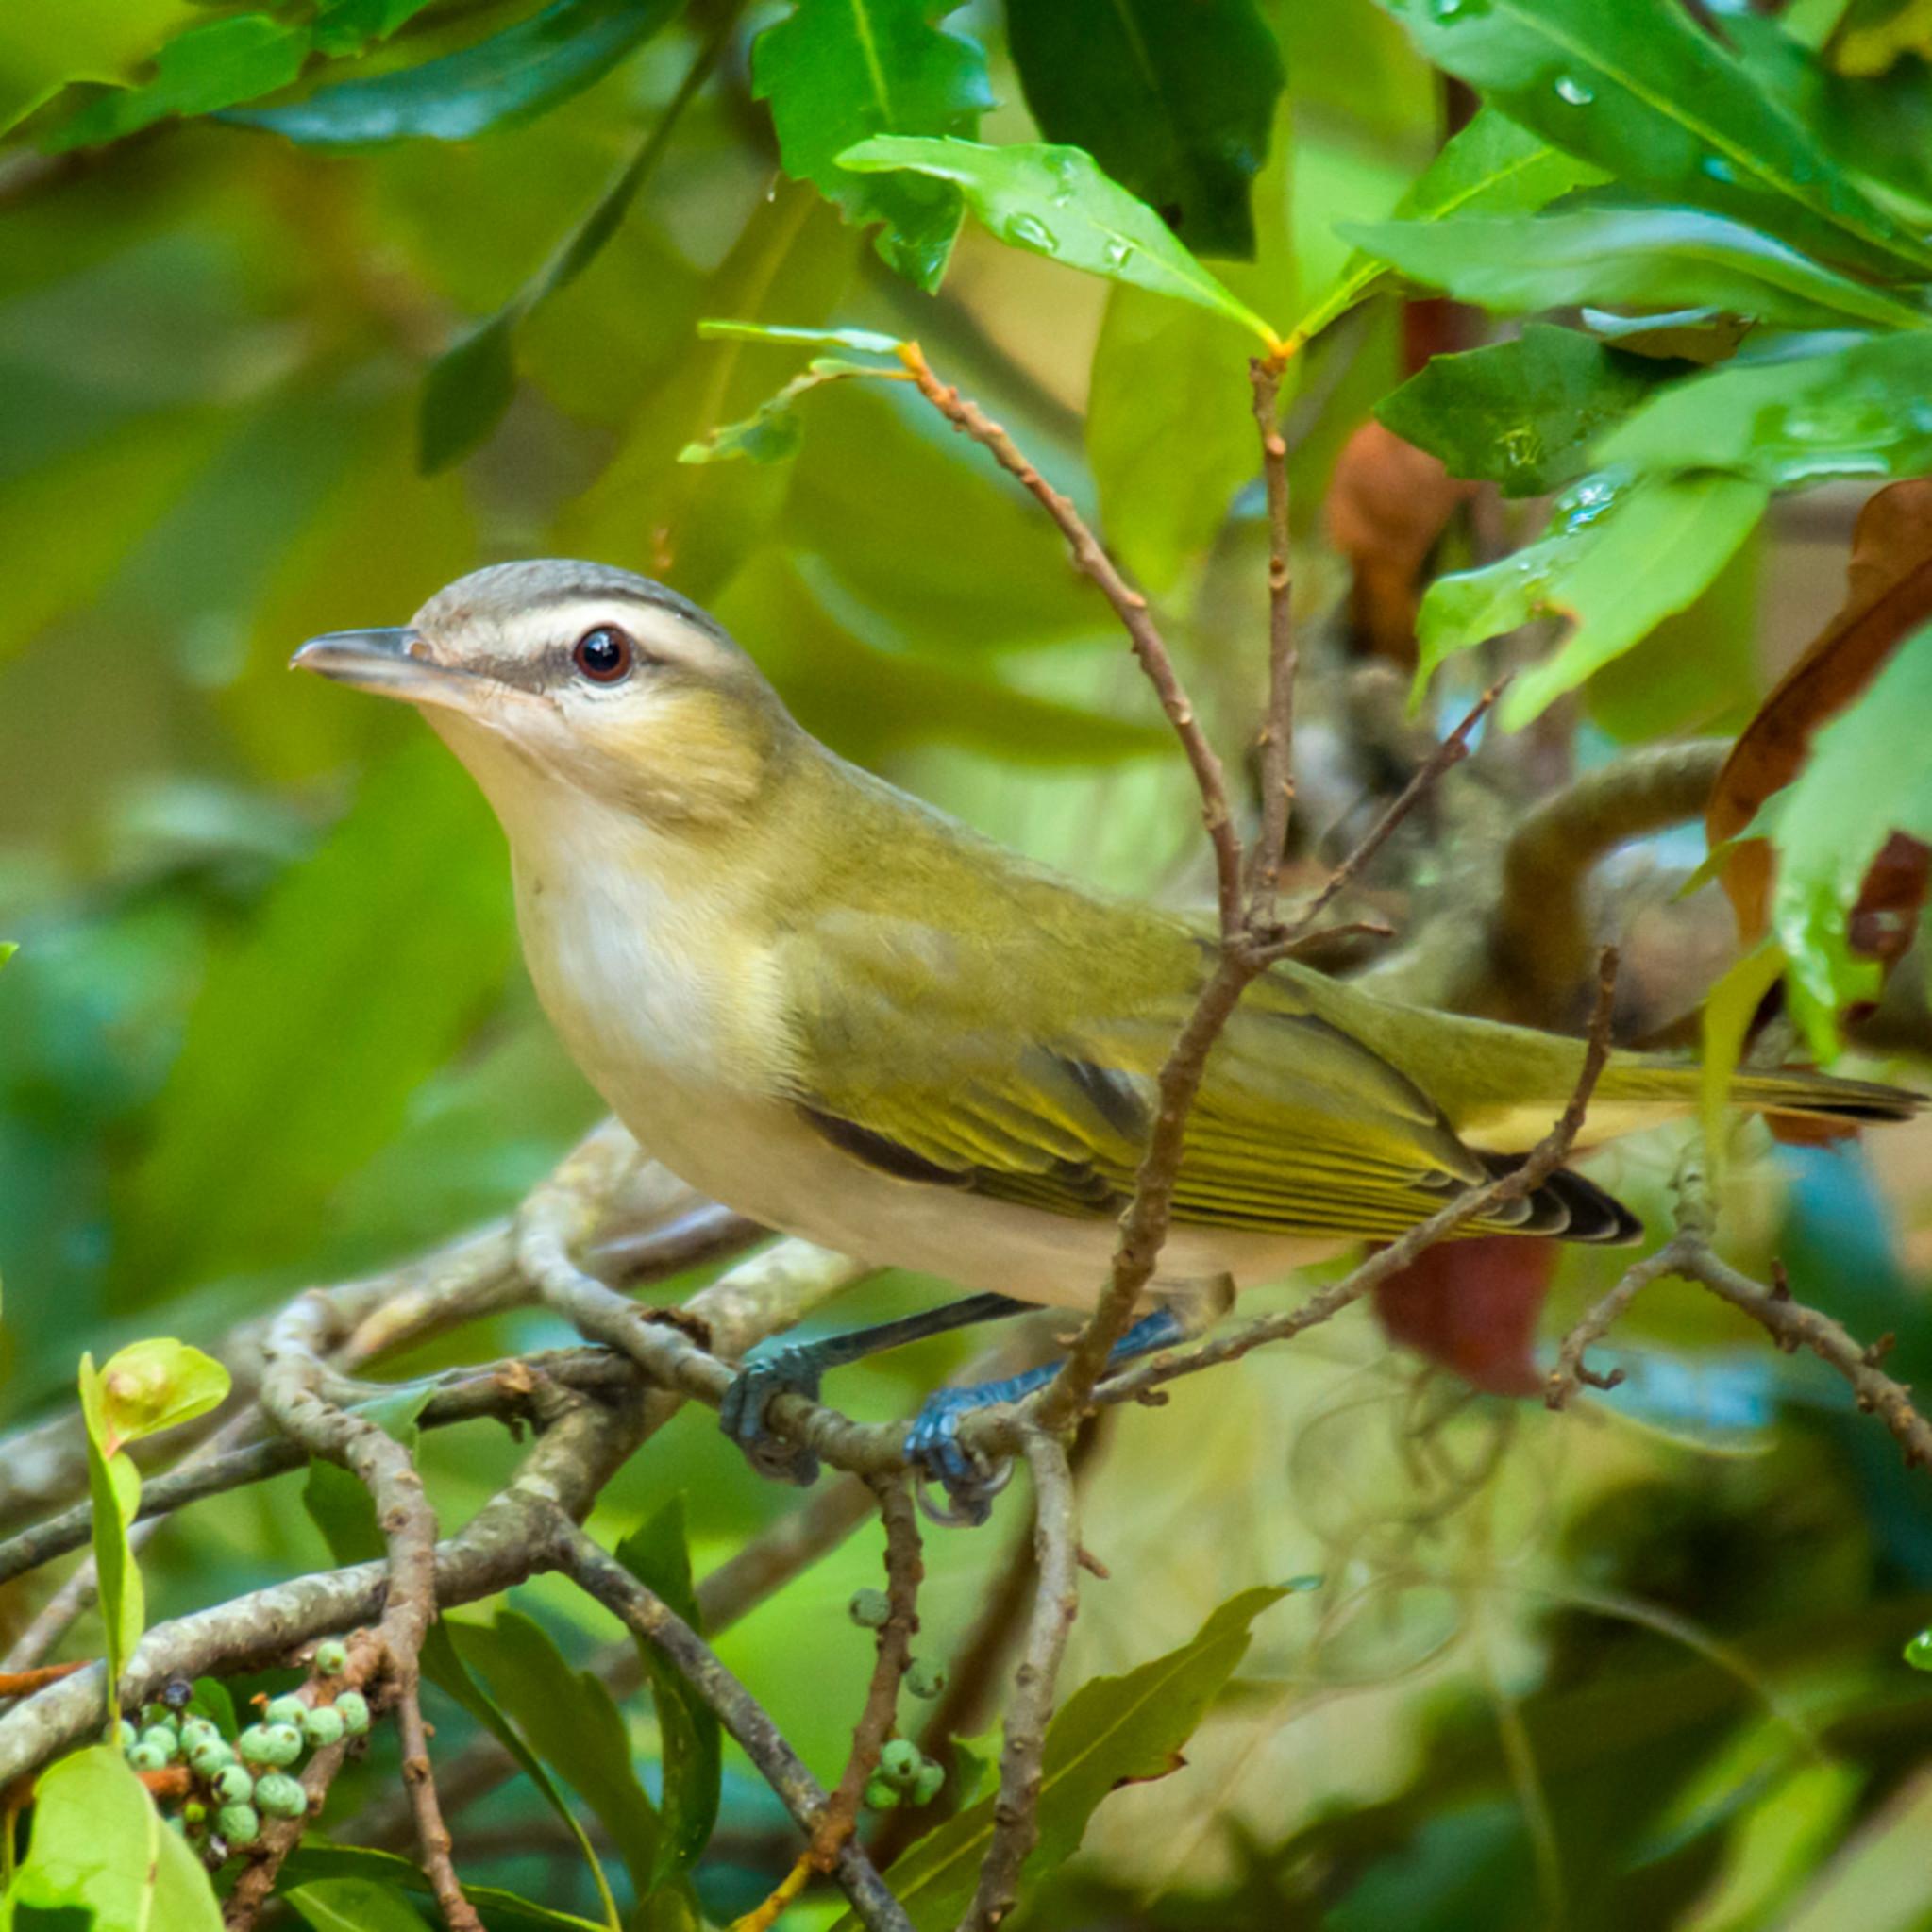 Backyard birds   aug2019  2 20190821 0180 isgobq